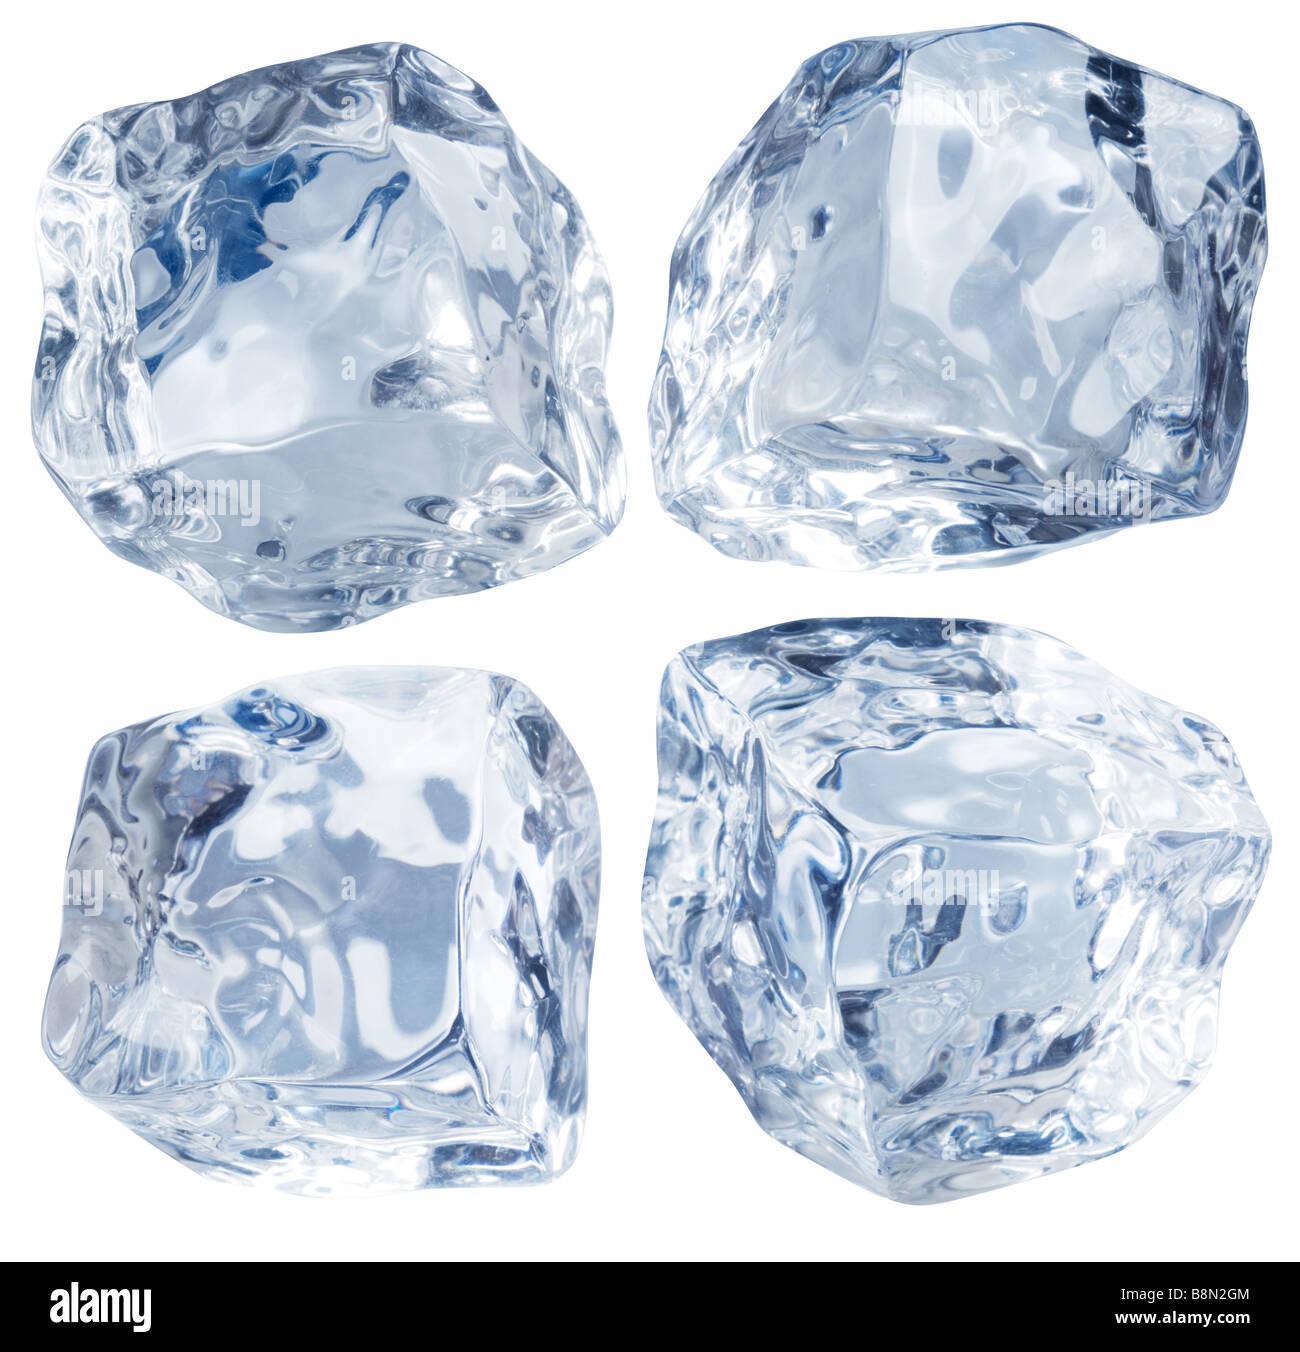 cube de glace Photo Stock